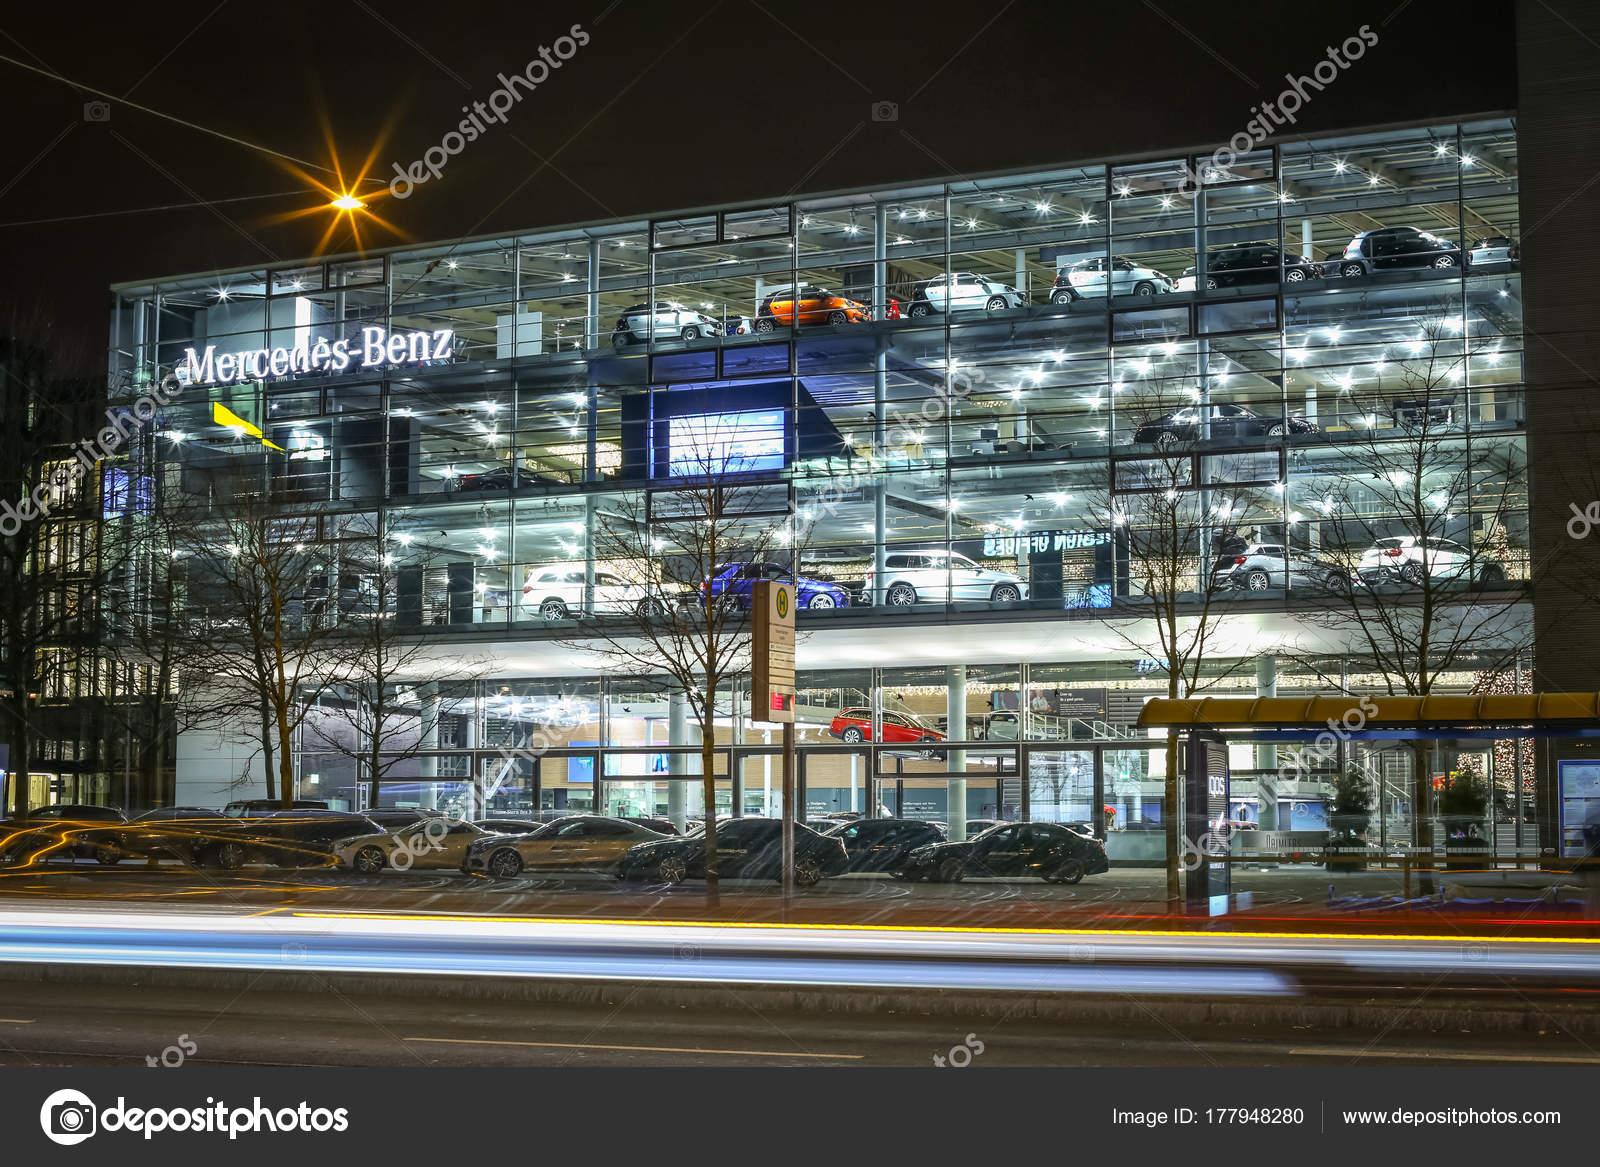 Mercedes Benz Dealership >> Mercedes Benz Dealership In Munich Stock Editorial Photo